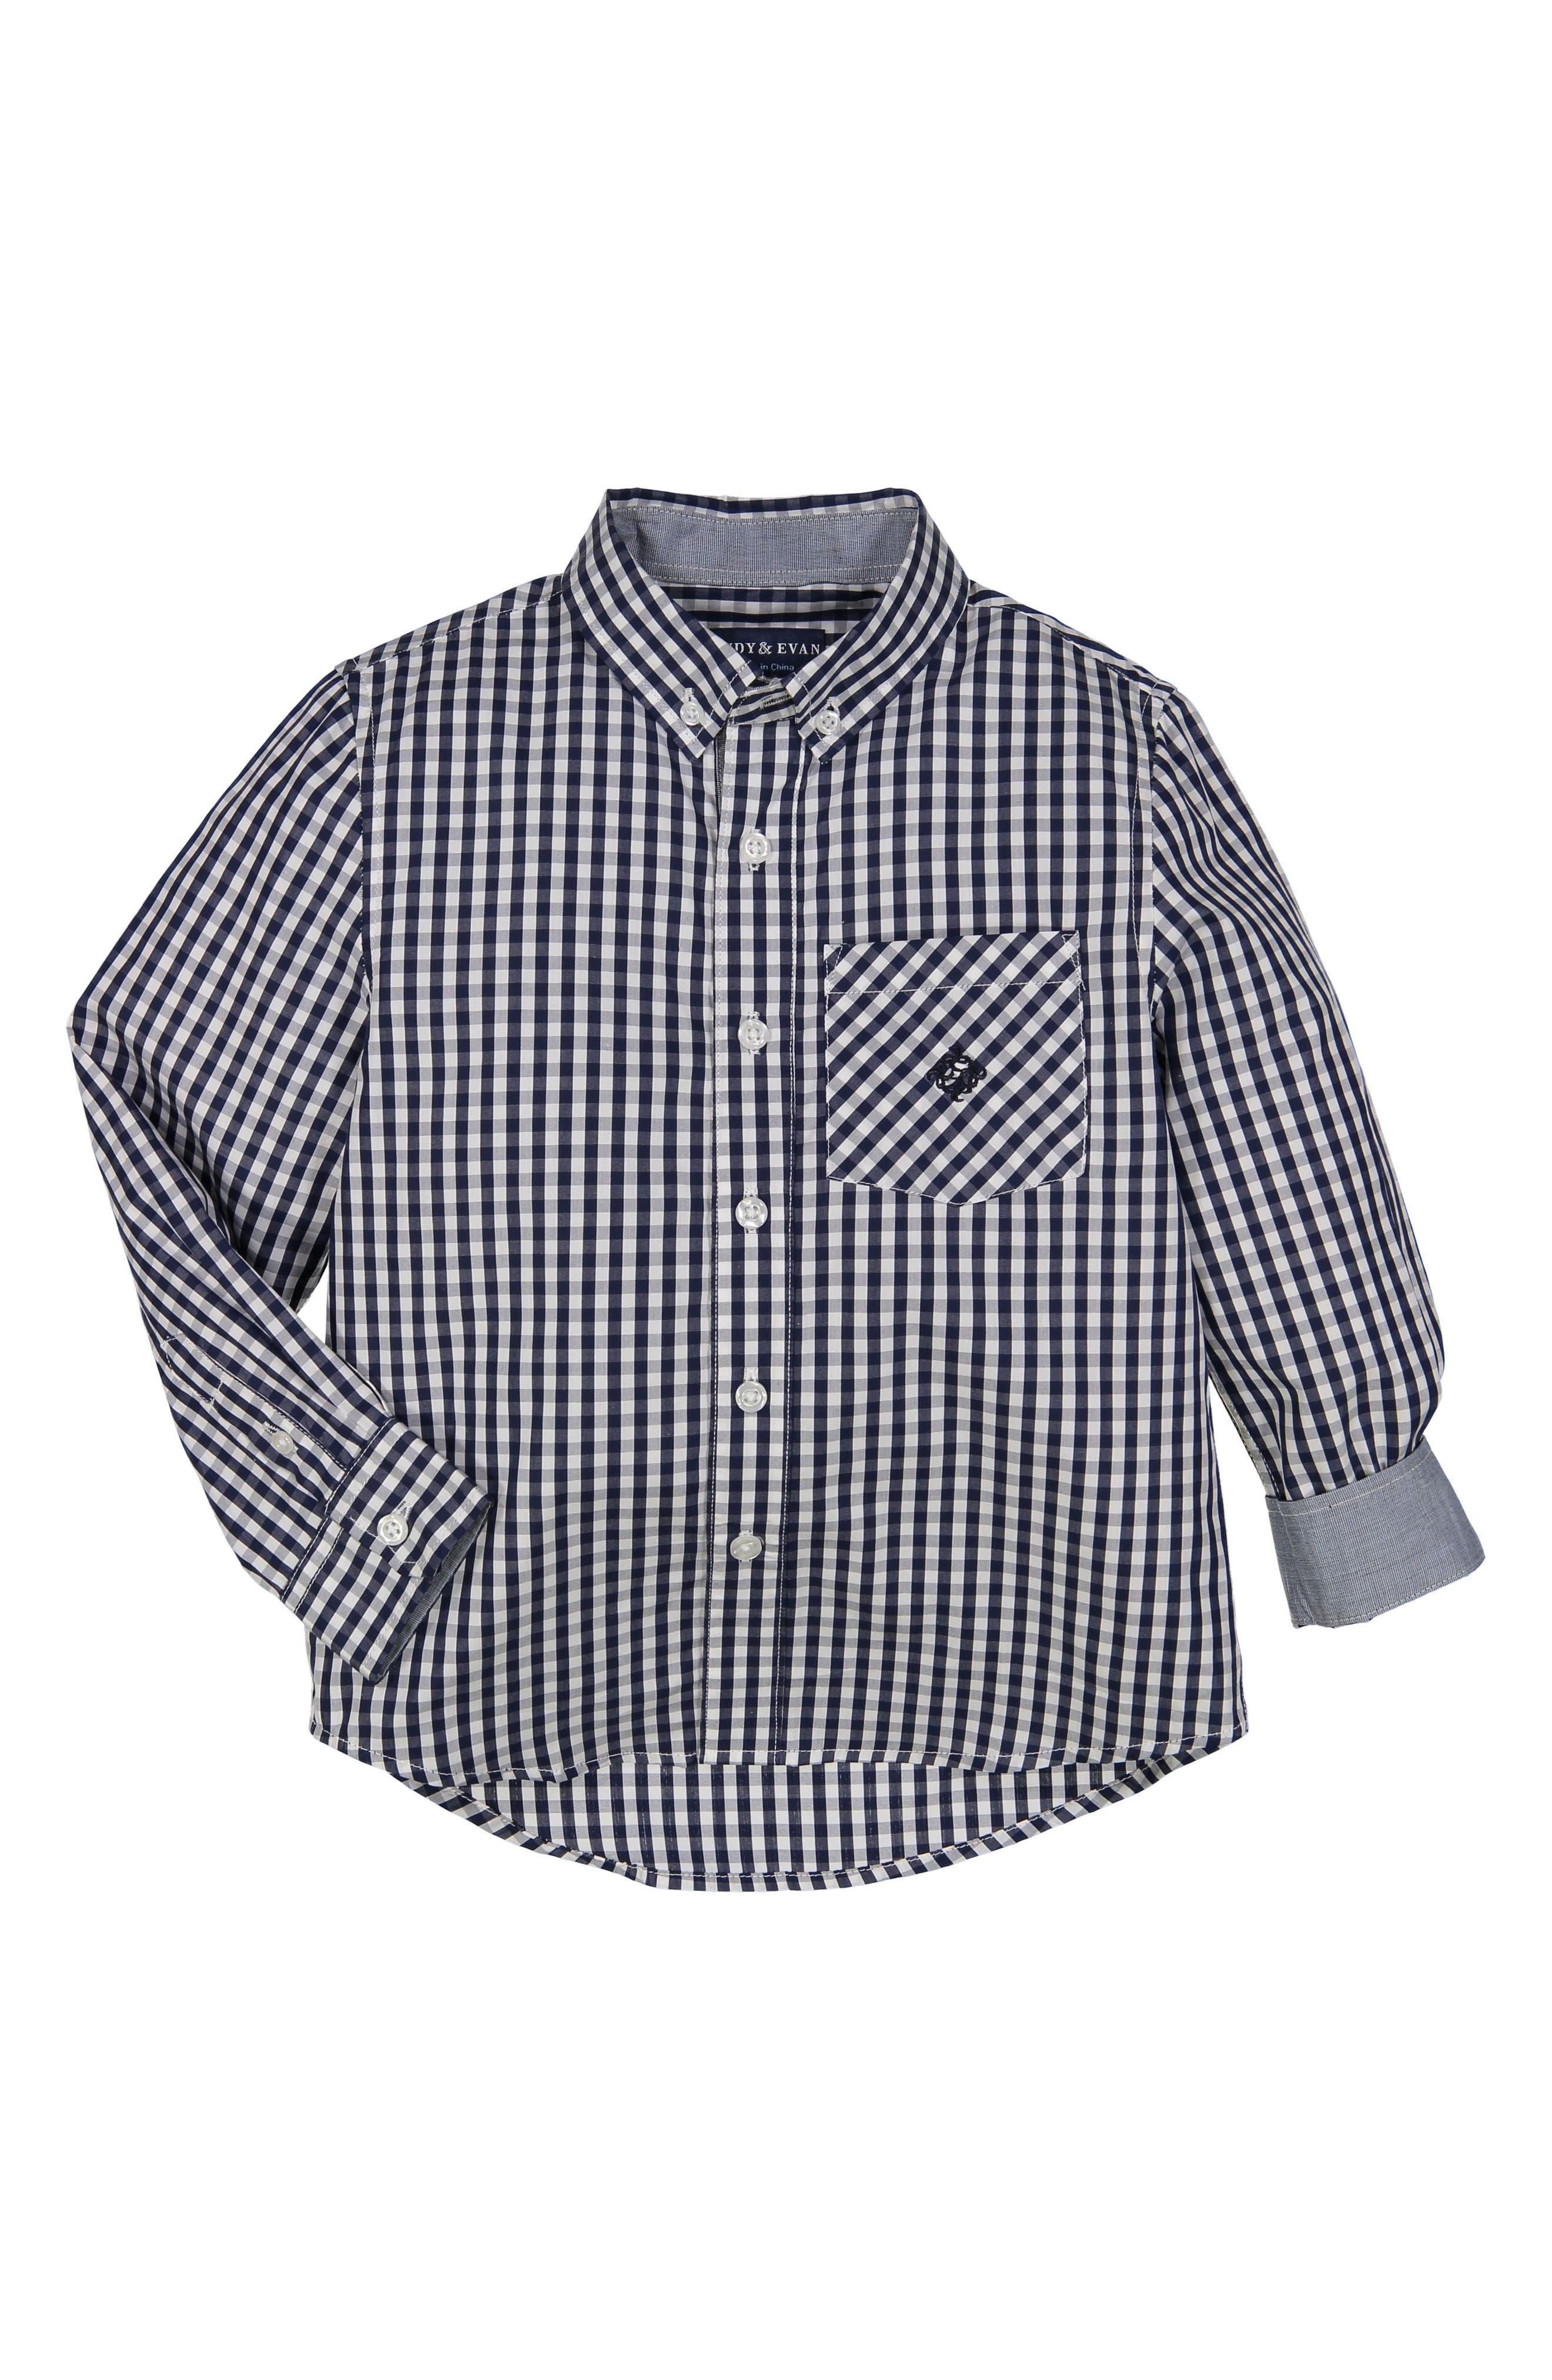 Gingham Check Woven Shirt,                         Main,                         color, Navy